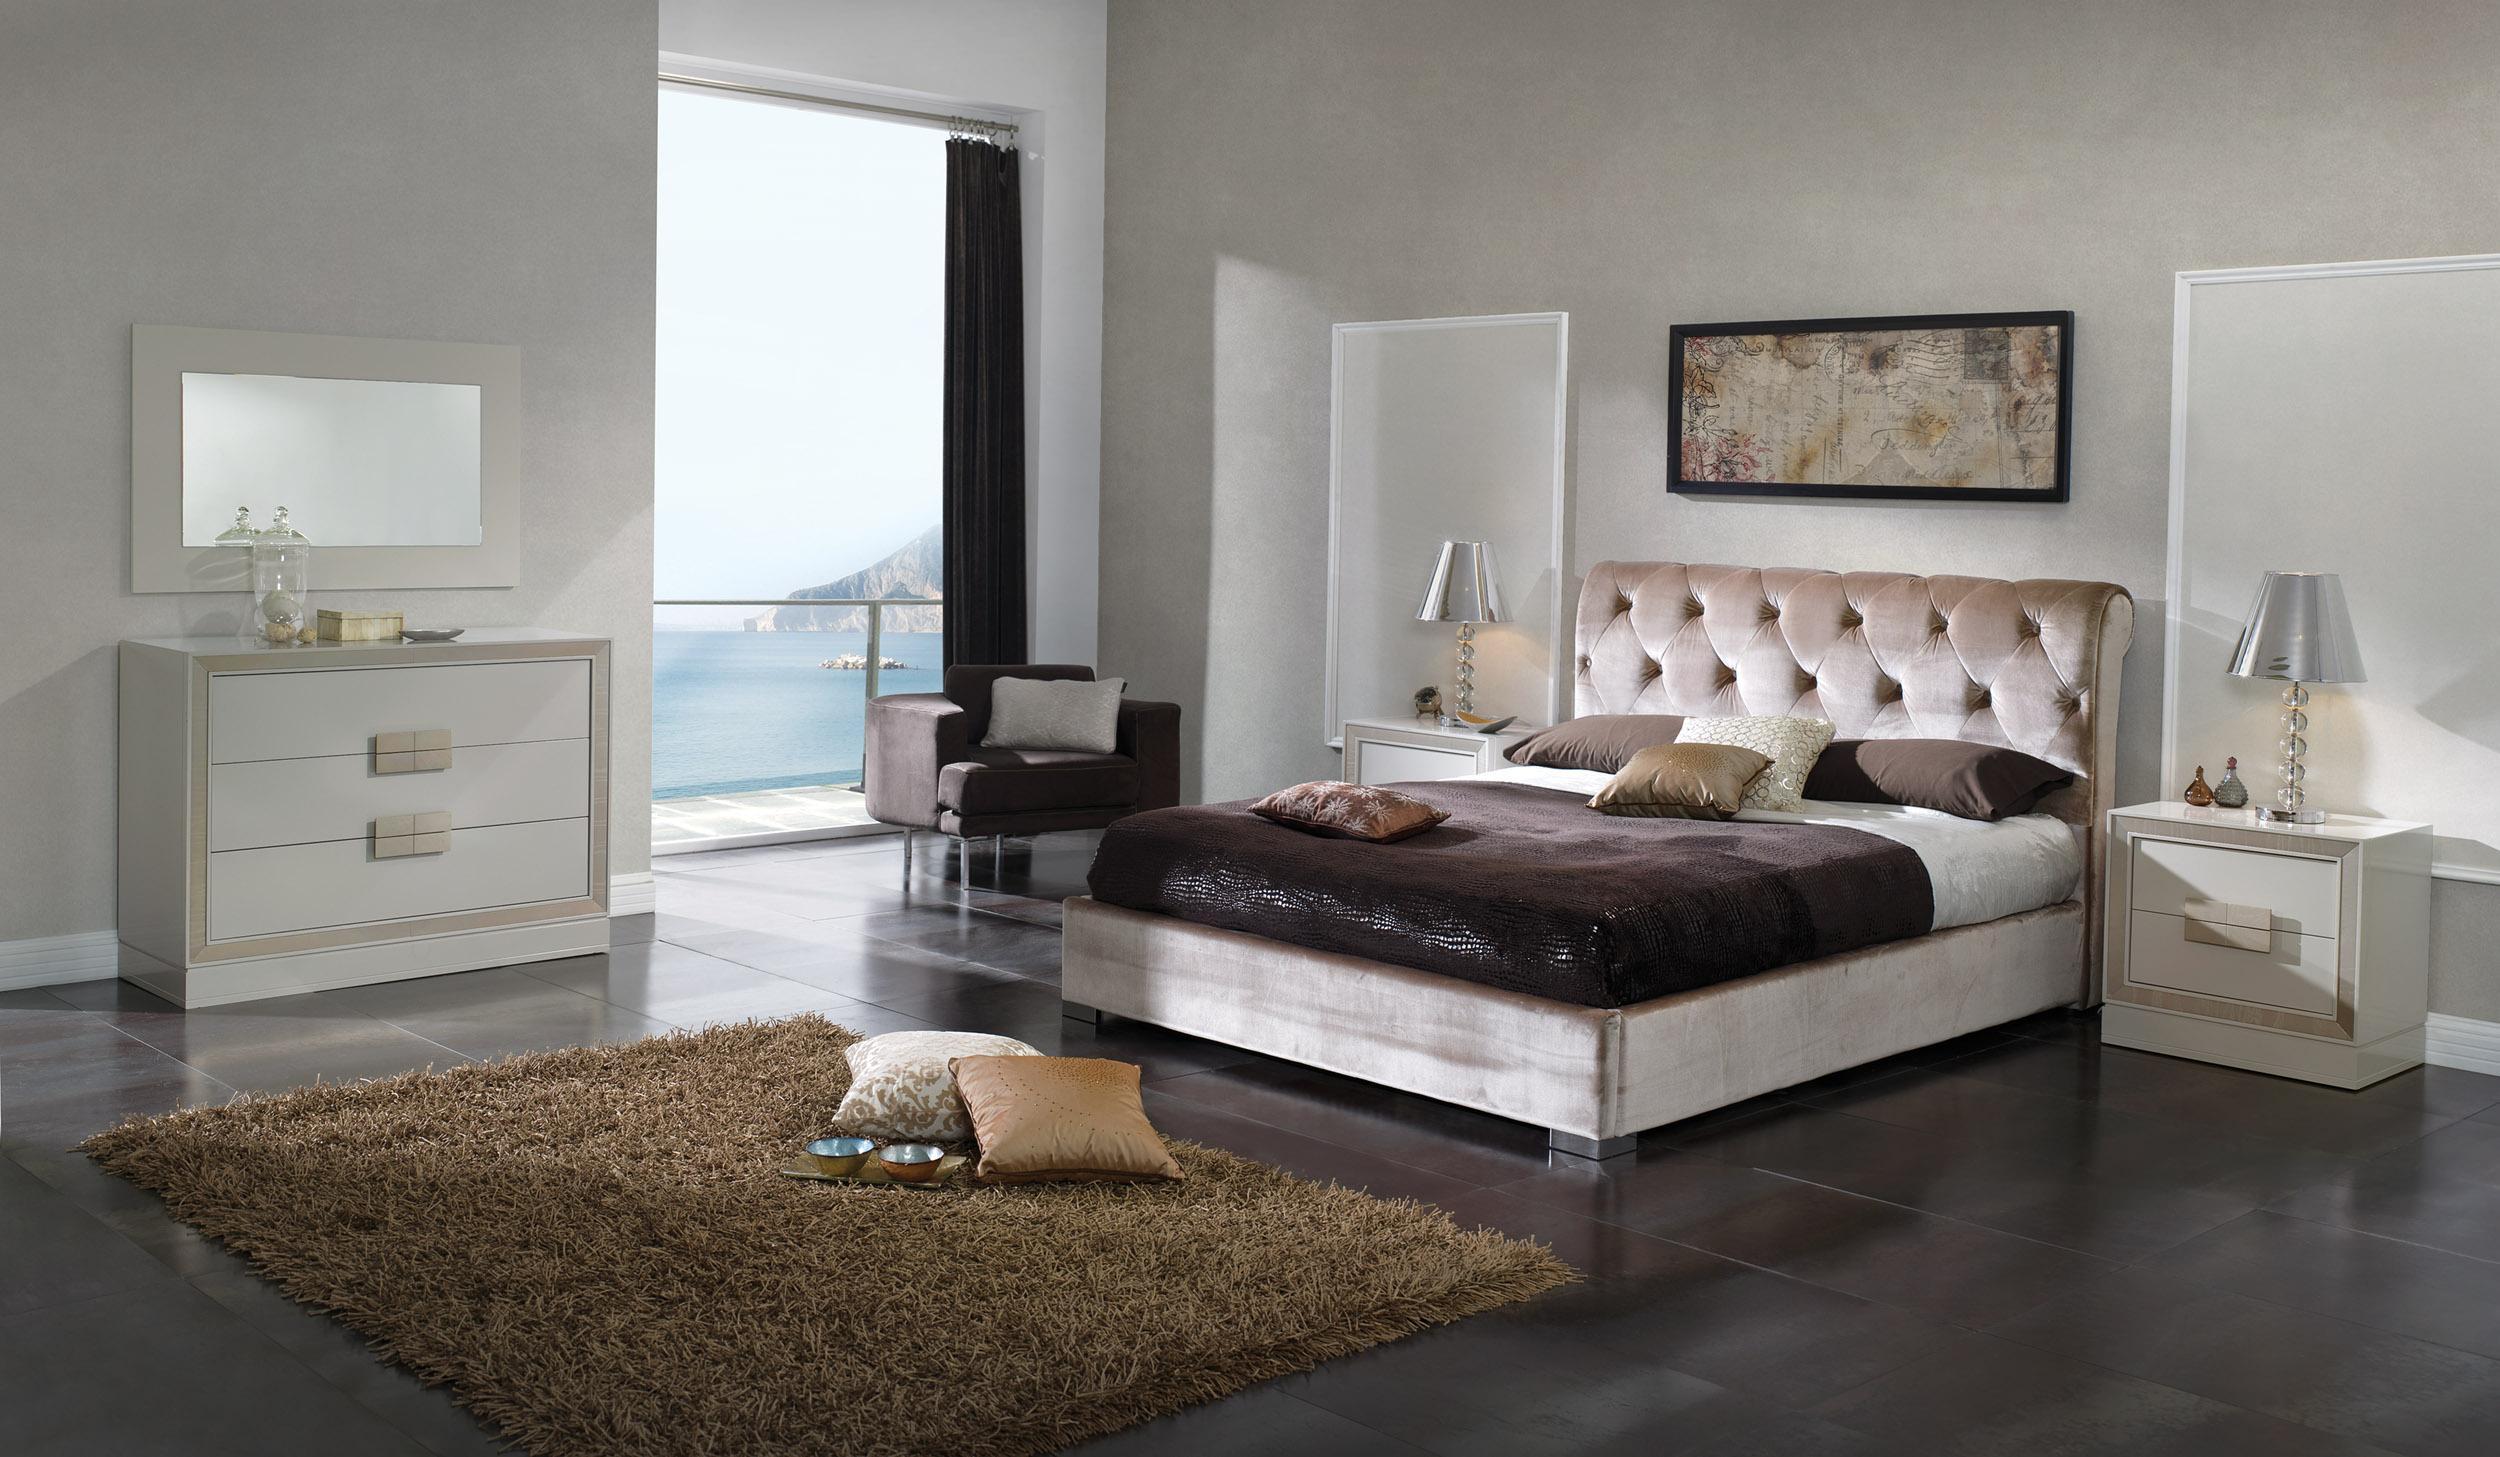 retro contemporary european bedroom set phoenix arizona esf miriam. Black Bedroom Furniture Sets. Home Design Ideas